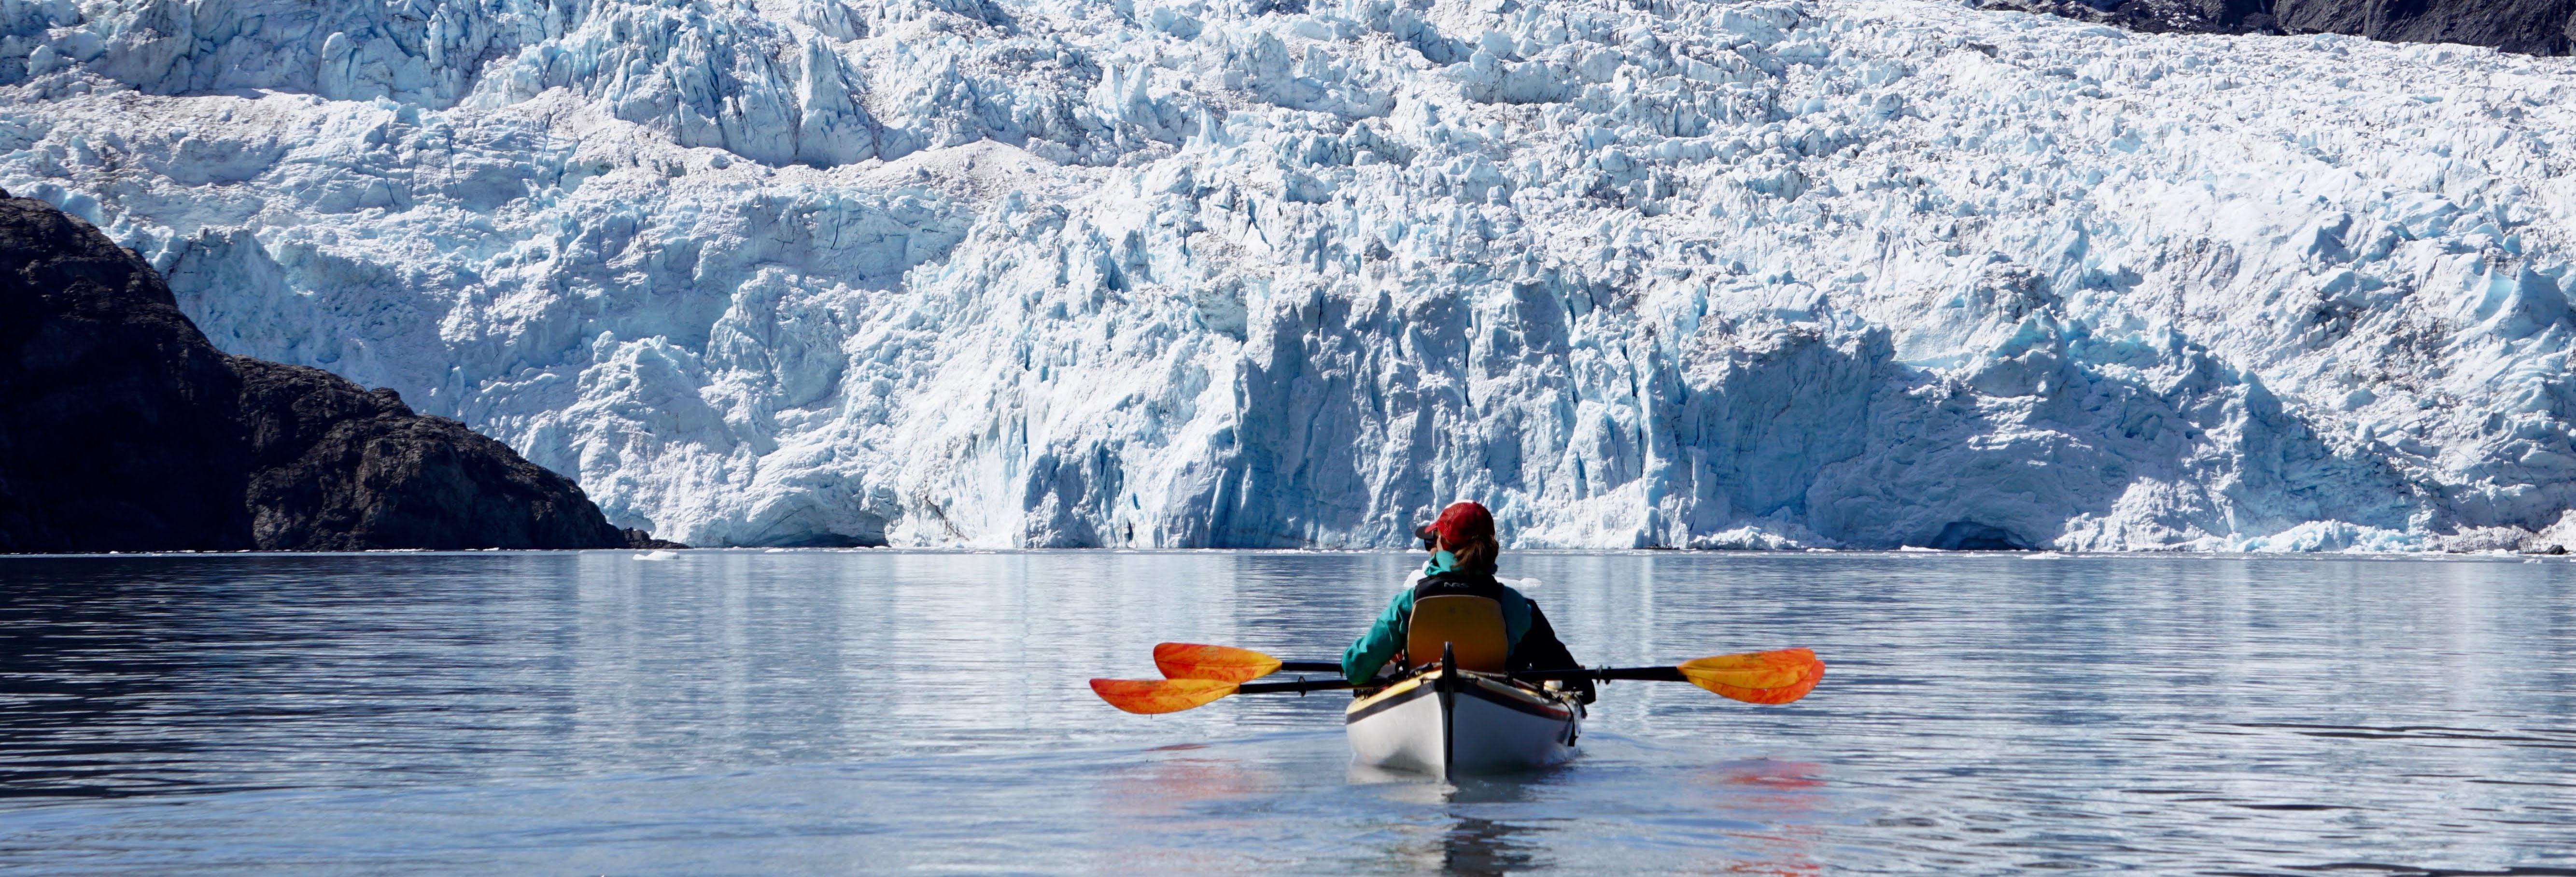 Glacier Kayaking in Aialik Bay! 2021